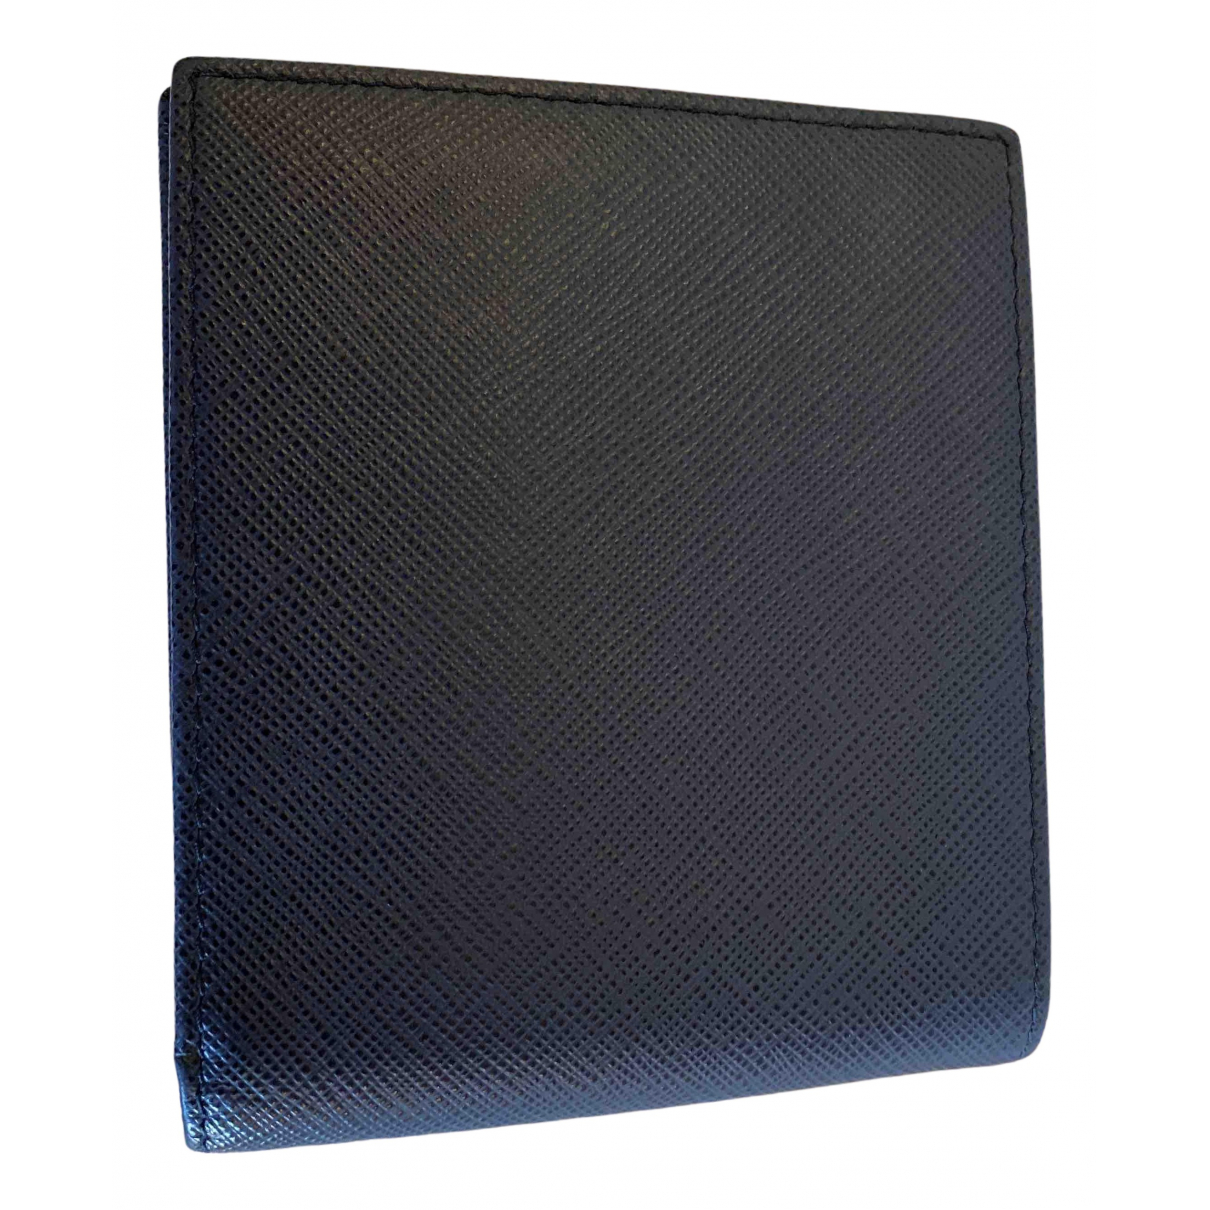 Prada - Petite maroquinerie   pour homme en cuir - bleu